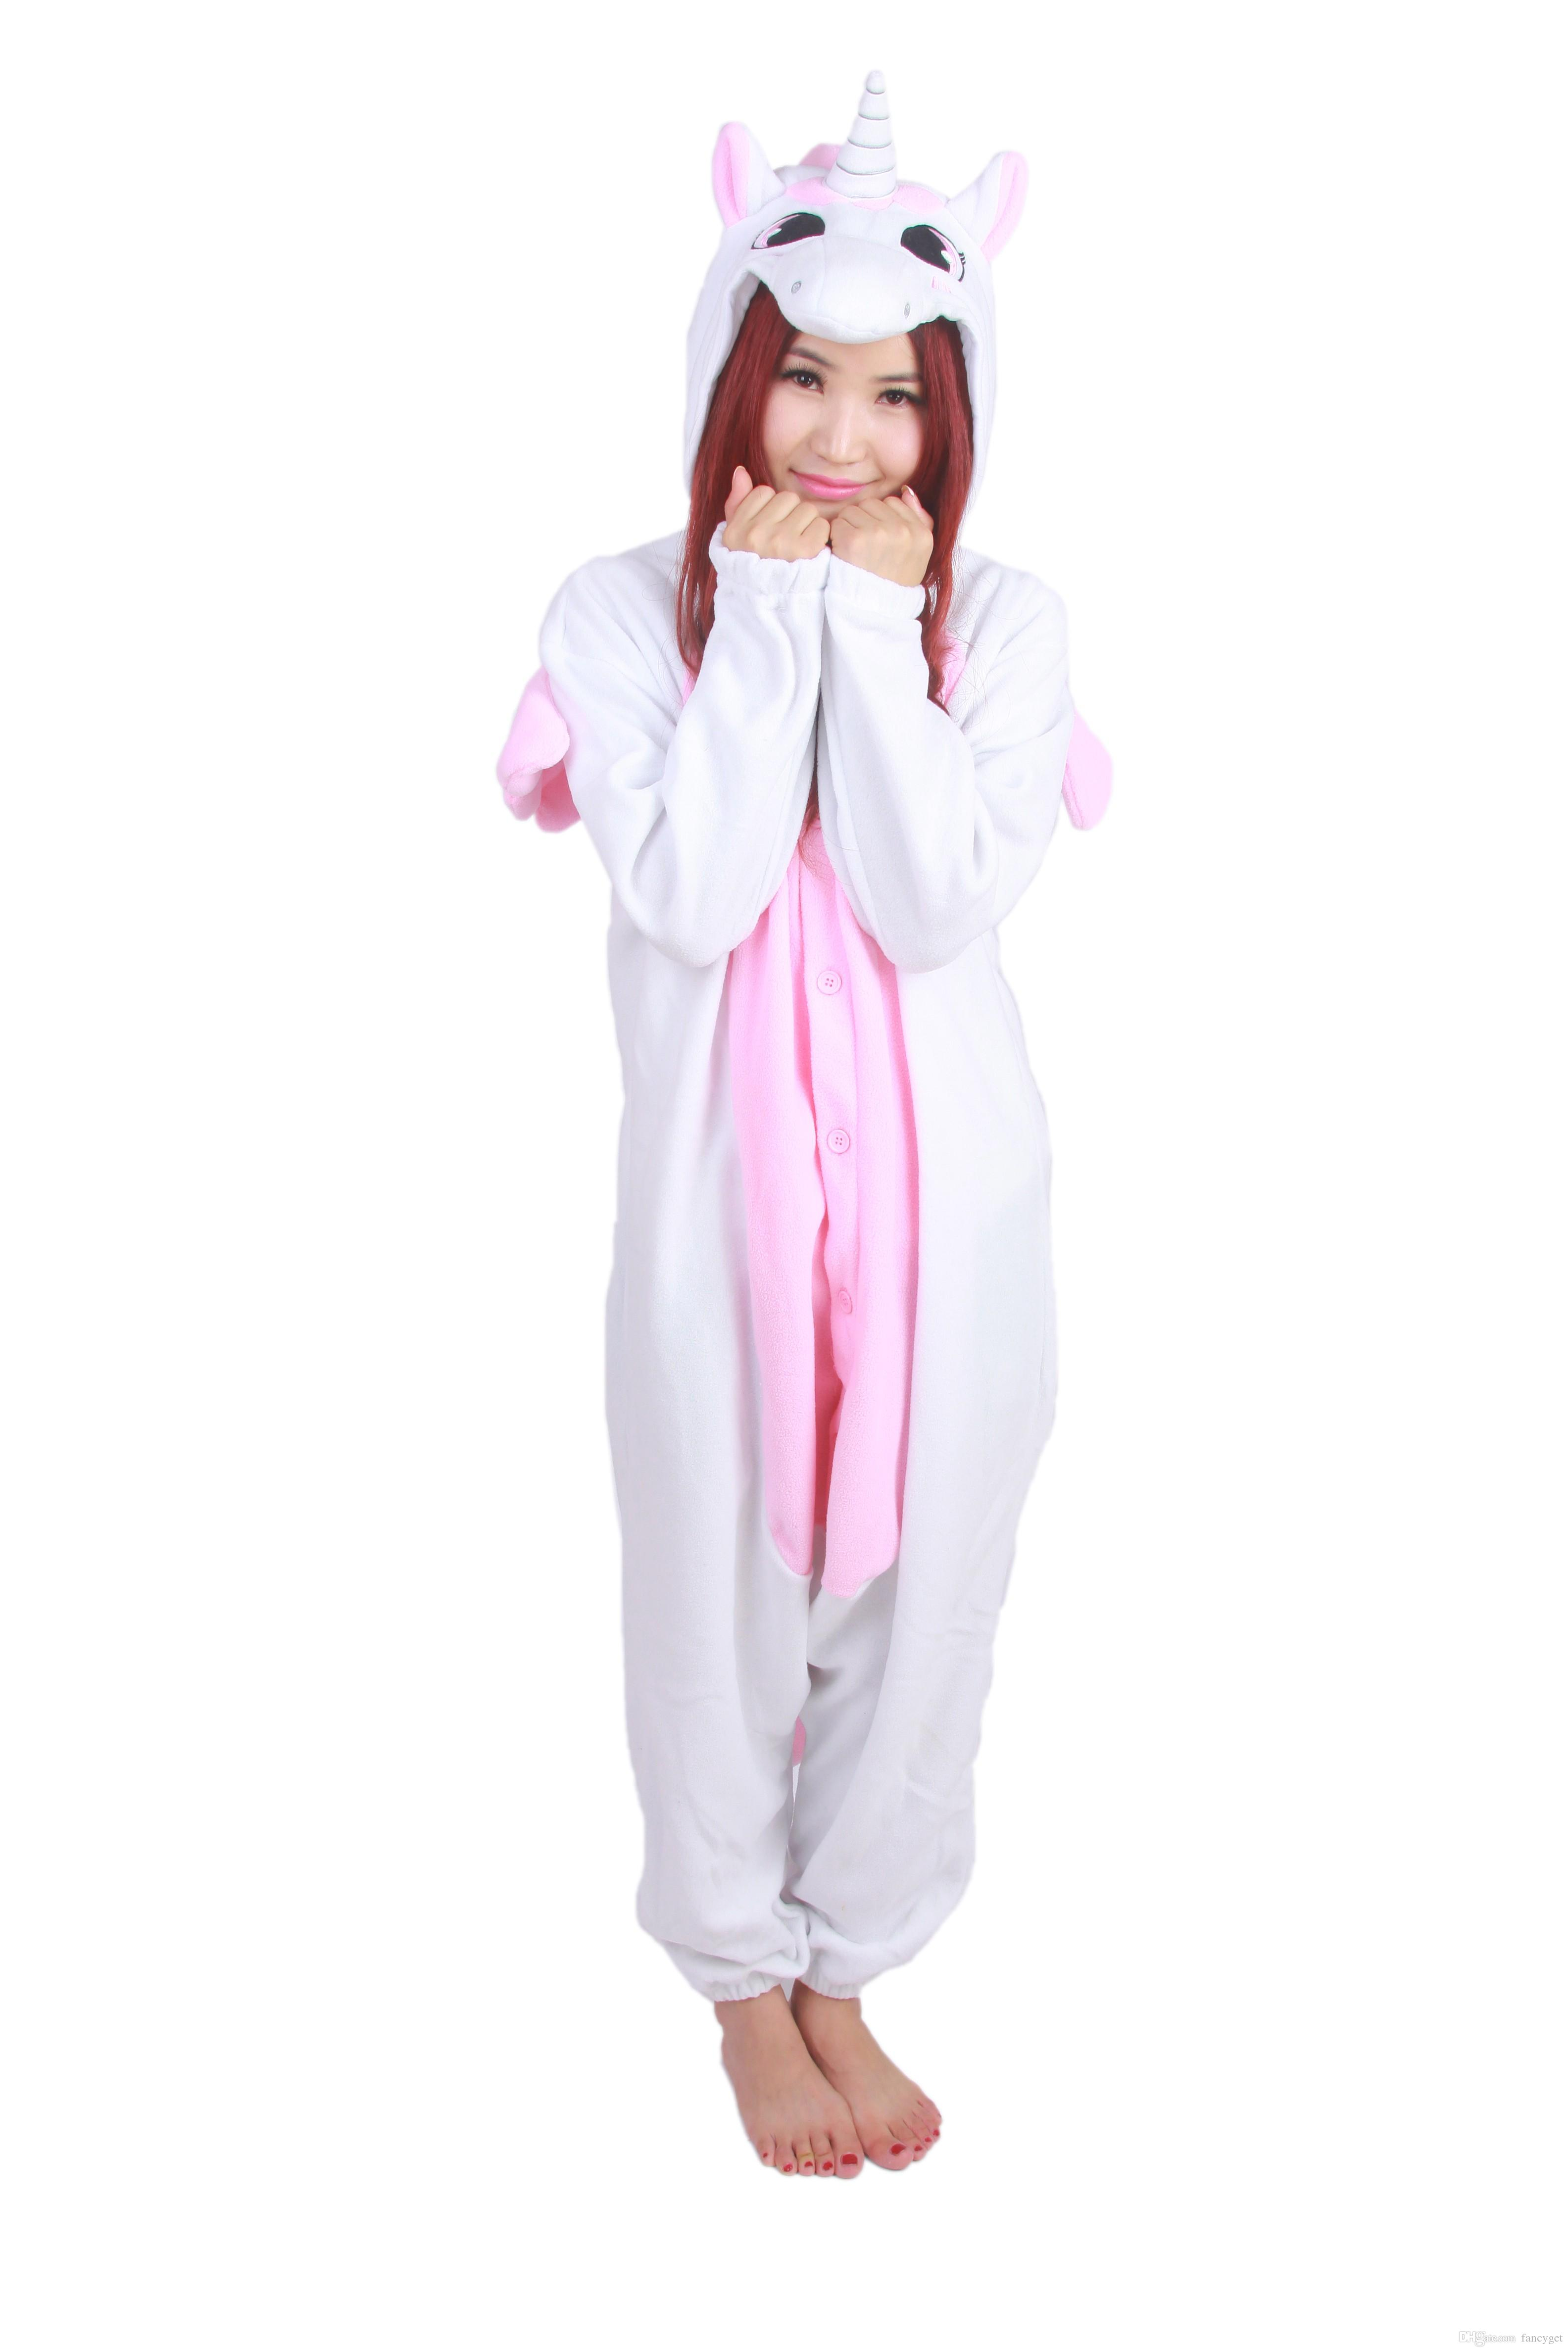 Buy hot! unisex couples cute cow fleece animal sleepwear cosplay one piece pajamas for autum winter s m l xl size, $52.36